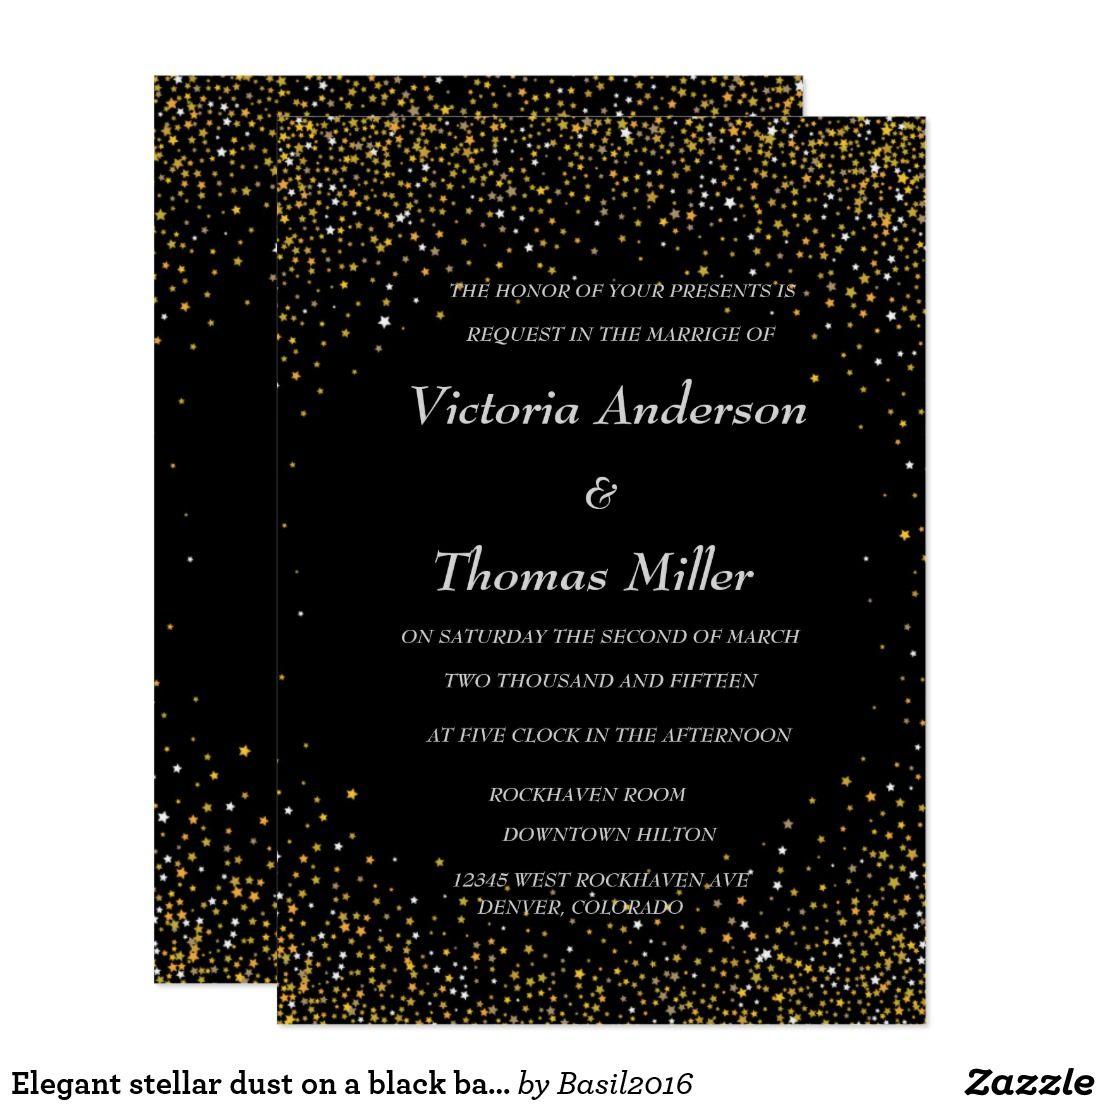 Elegant Stellar Dust On A Black Background Invitation Zazzle Com Black Backgrounds Invitations Elegant